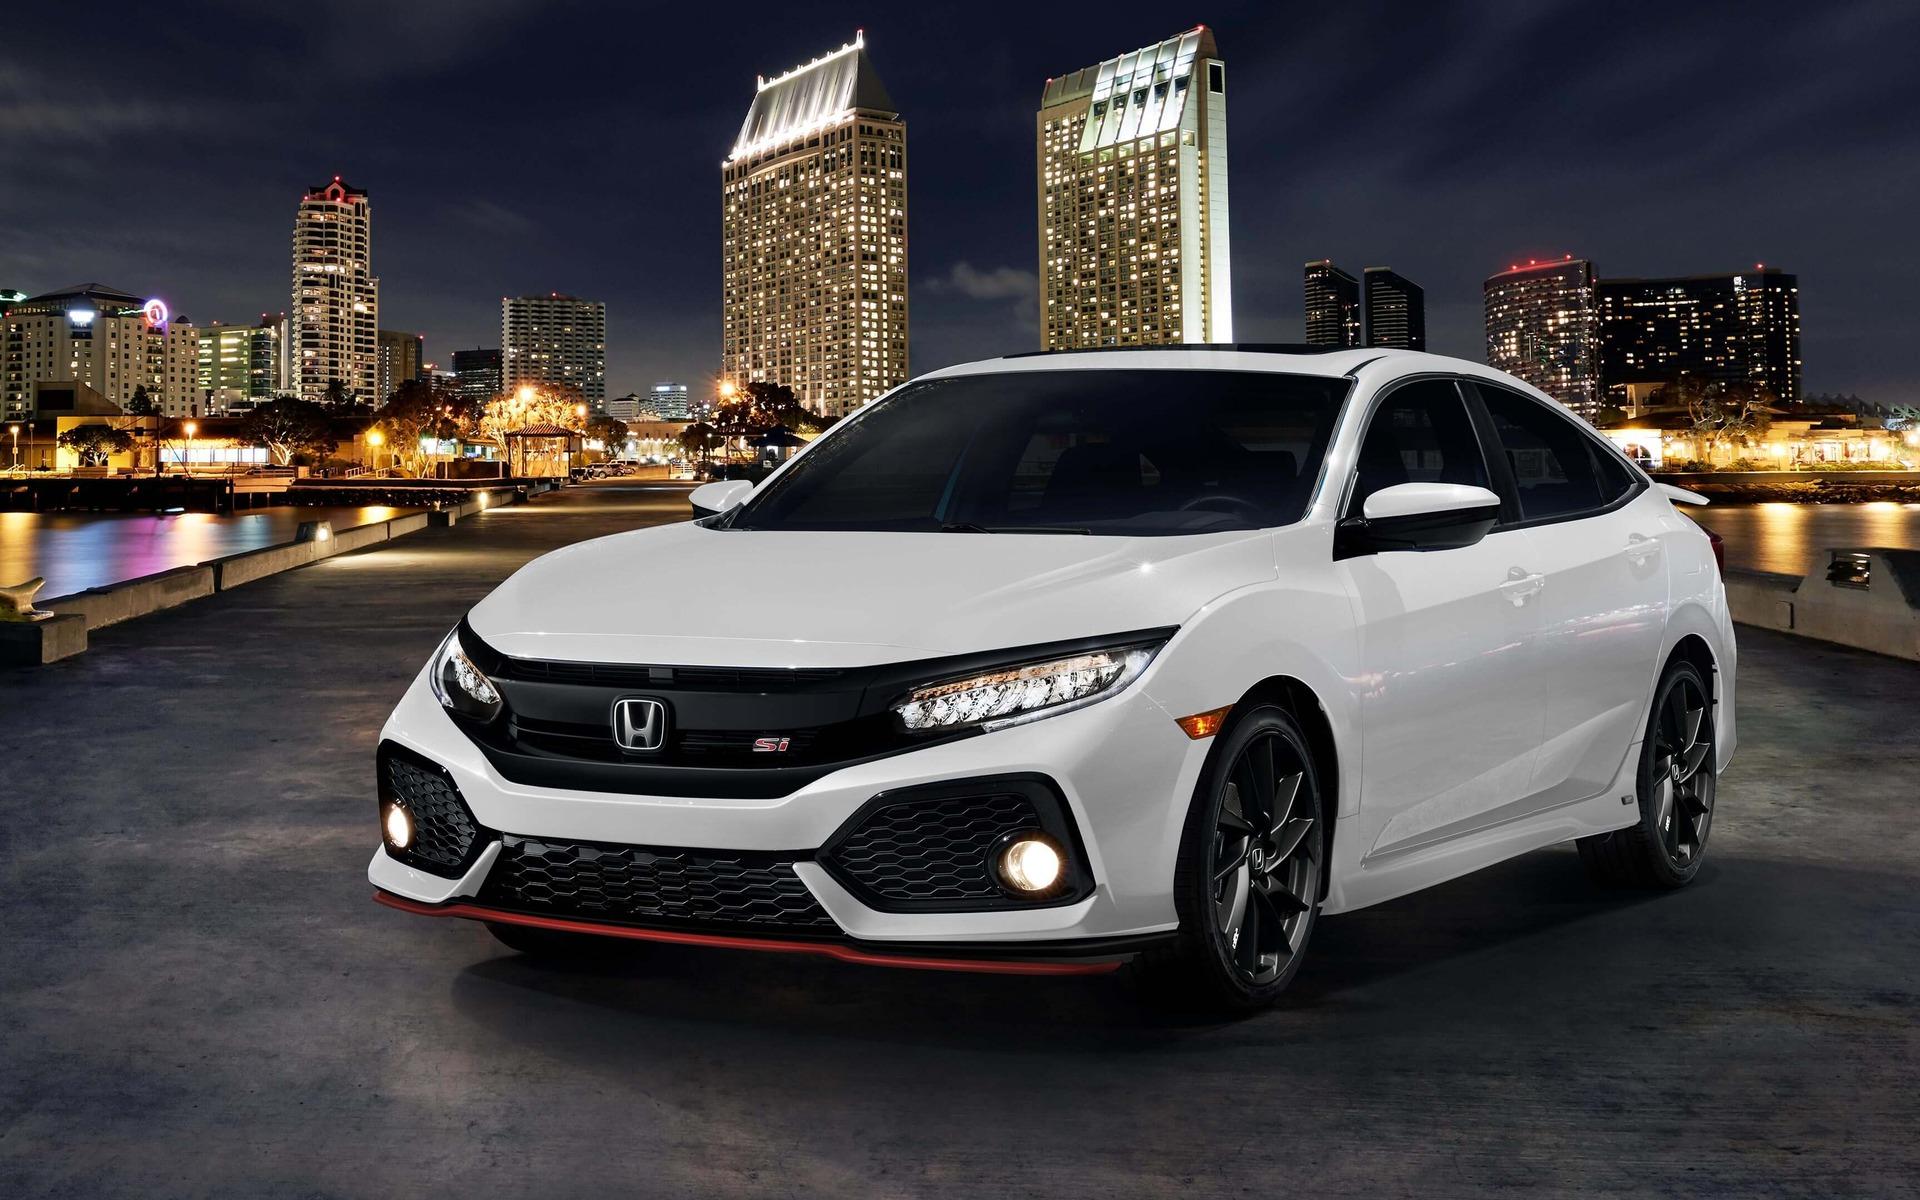 Honda Civic Si HFP Coupé 2018